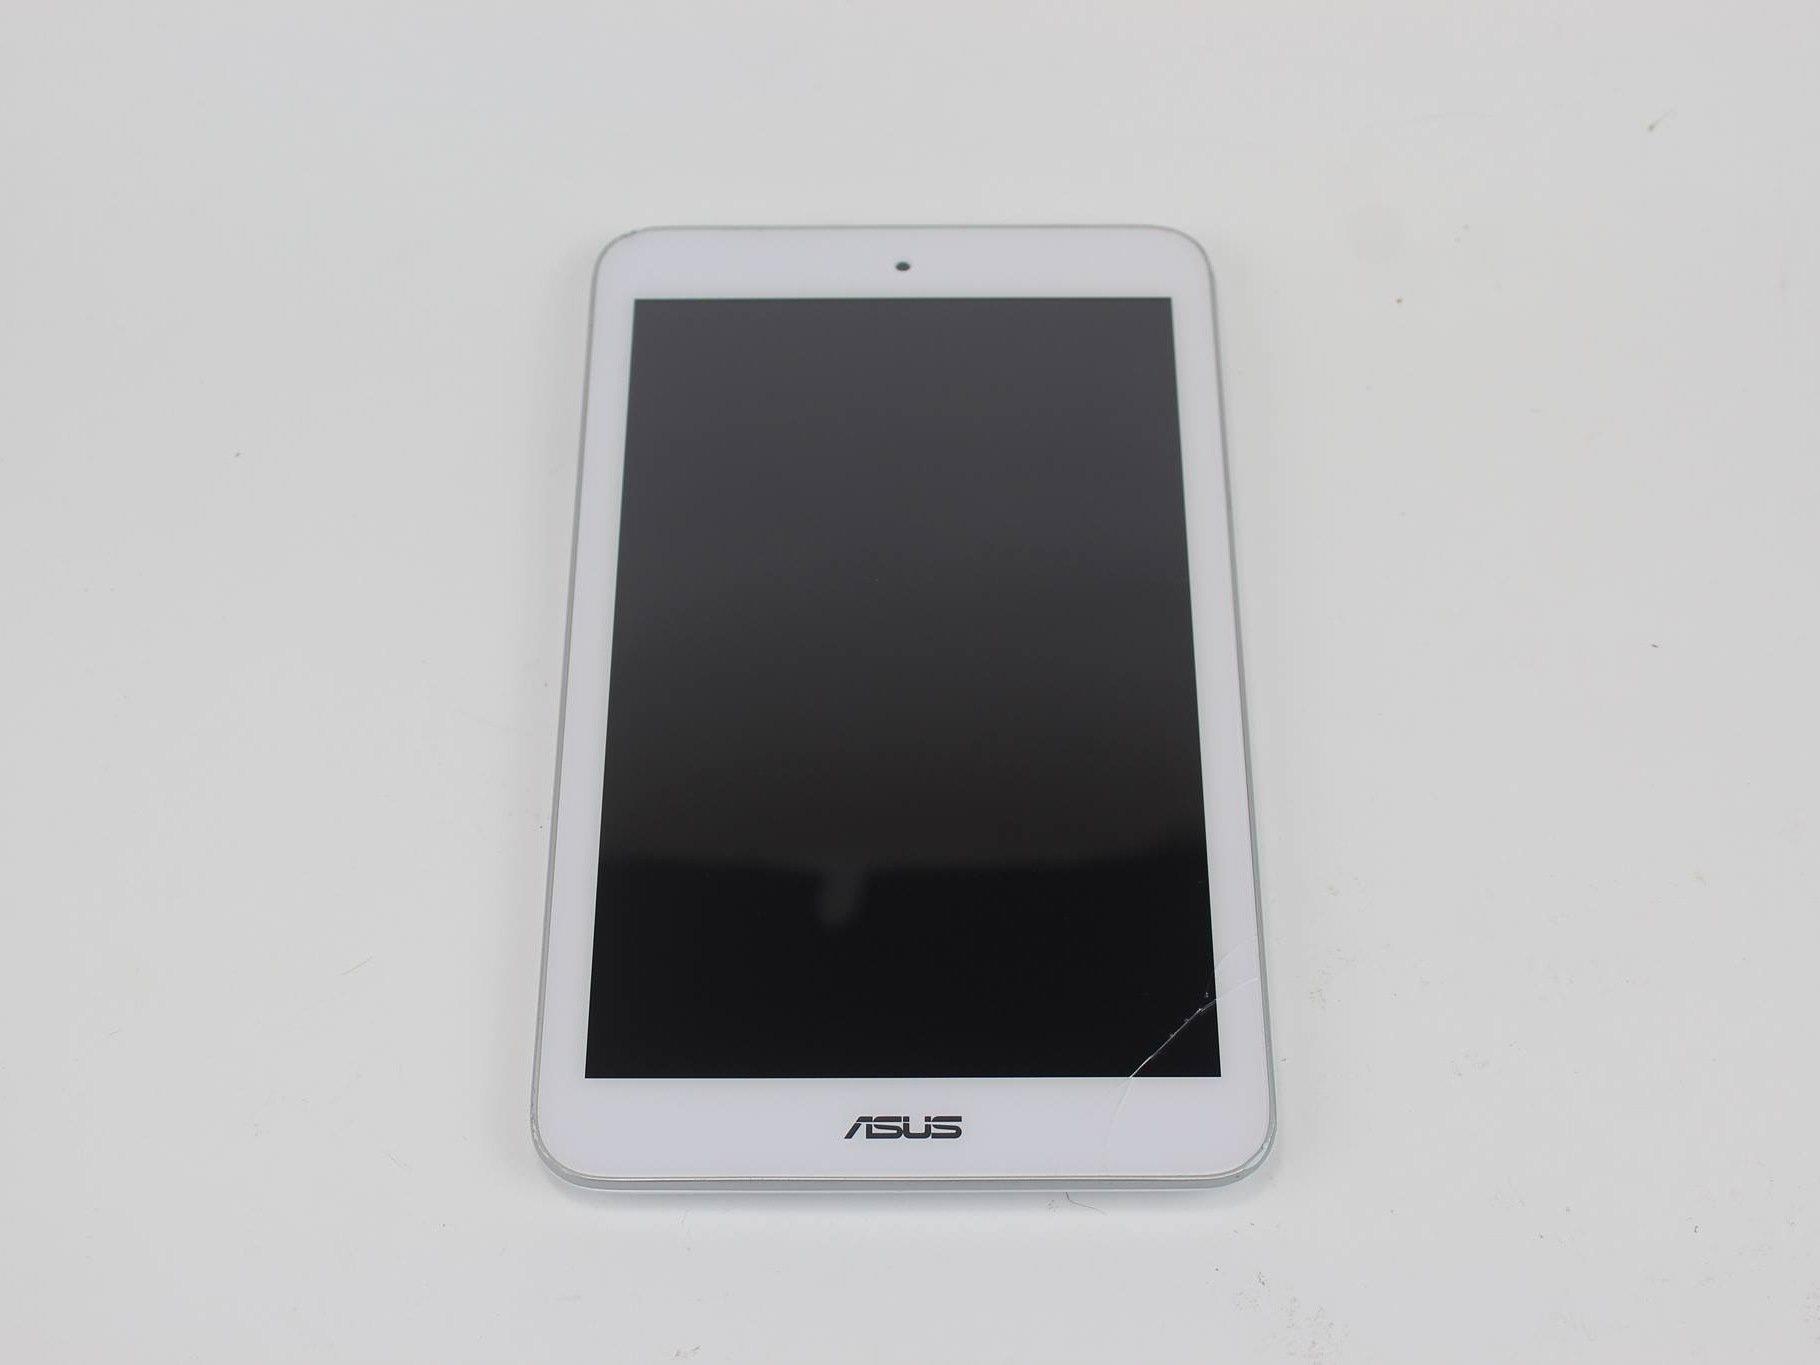 asus memo tablet battery replacement